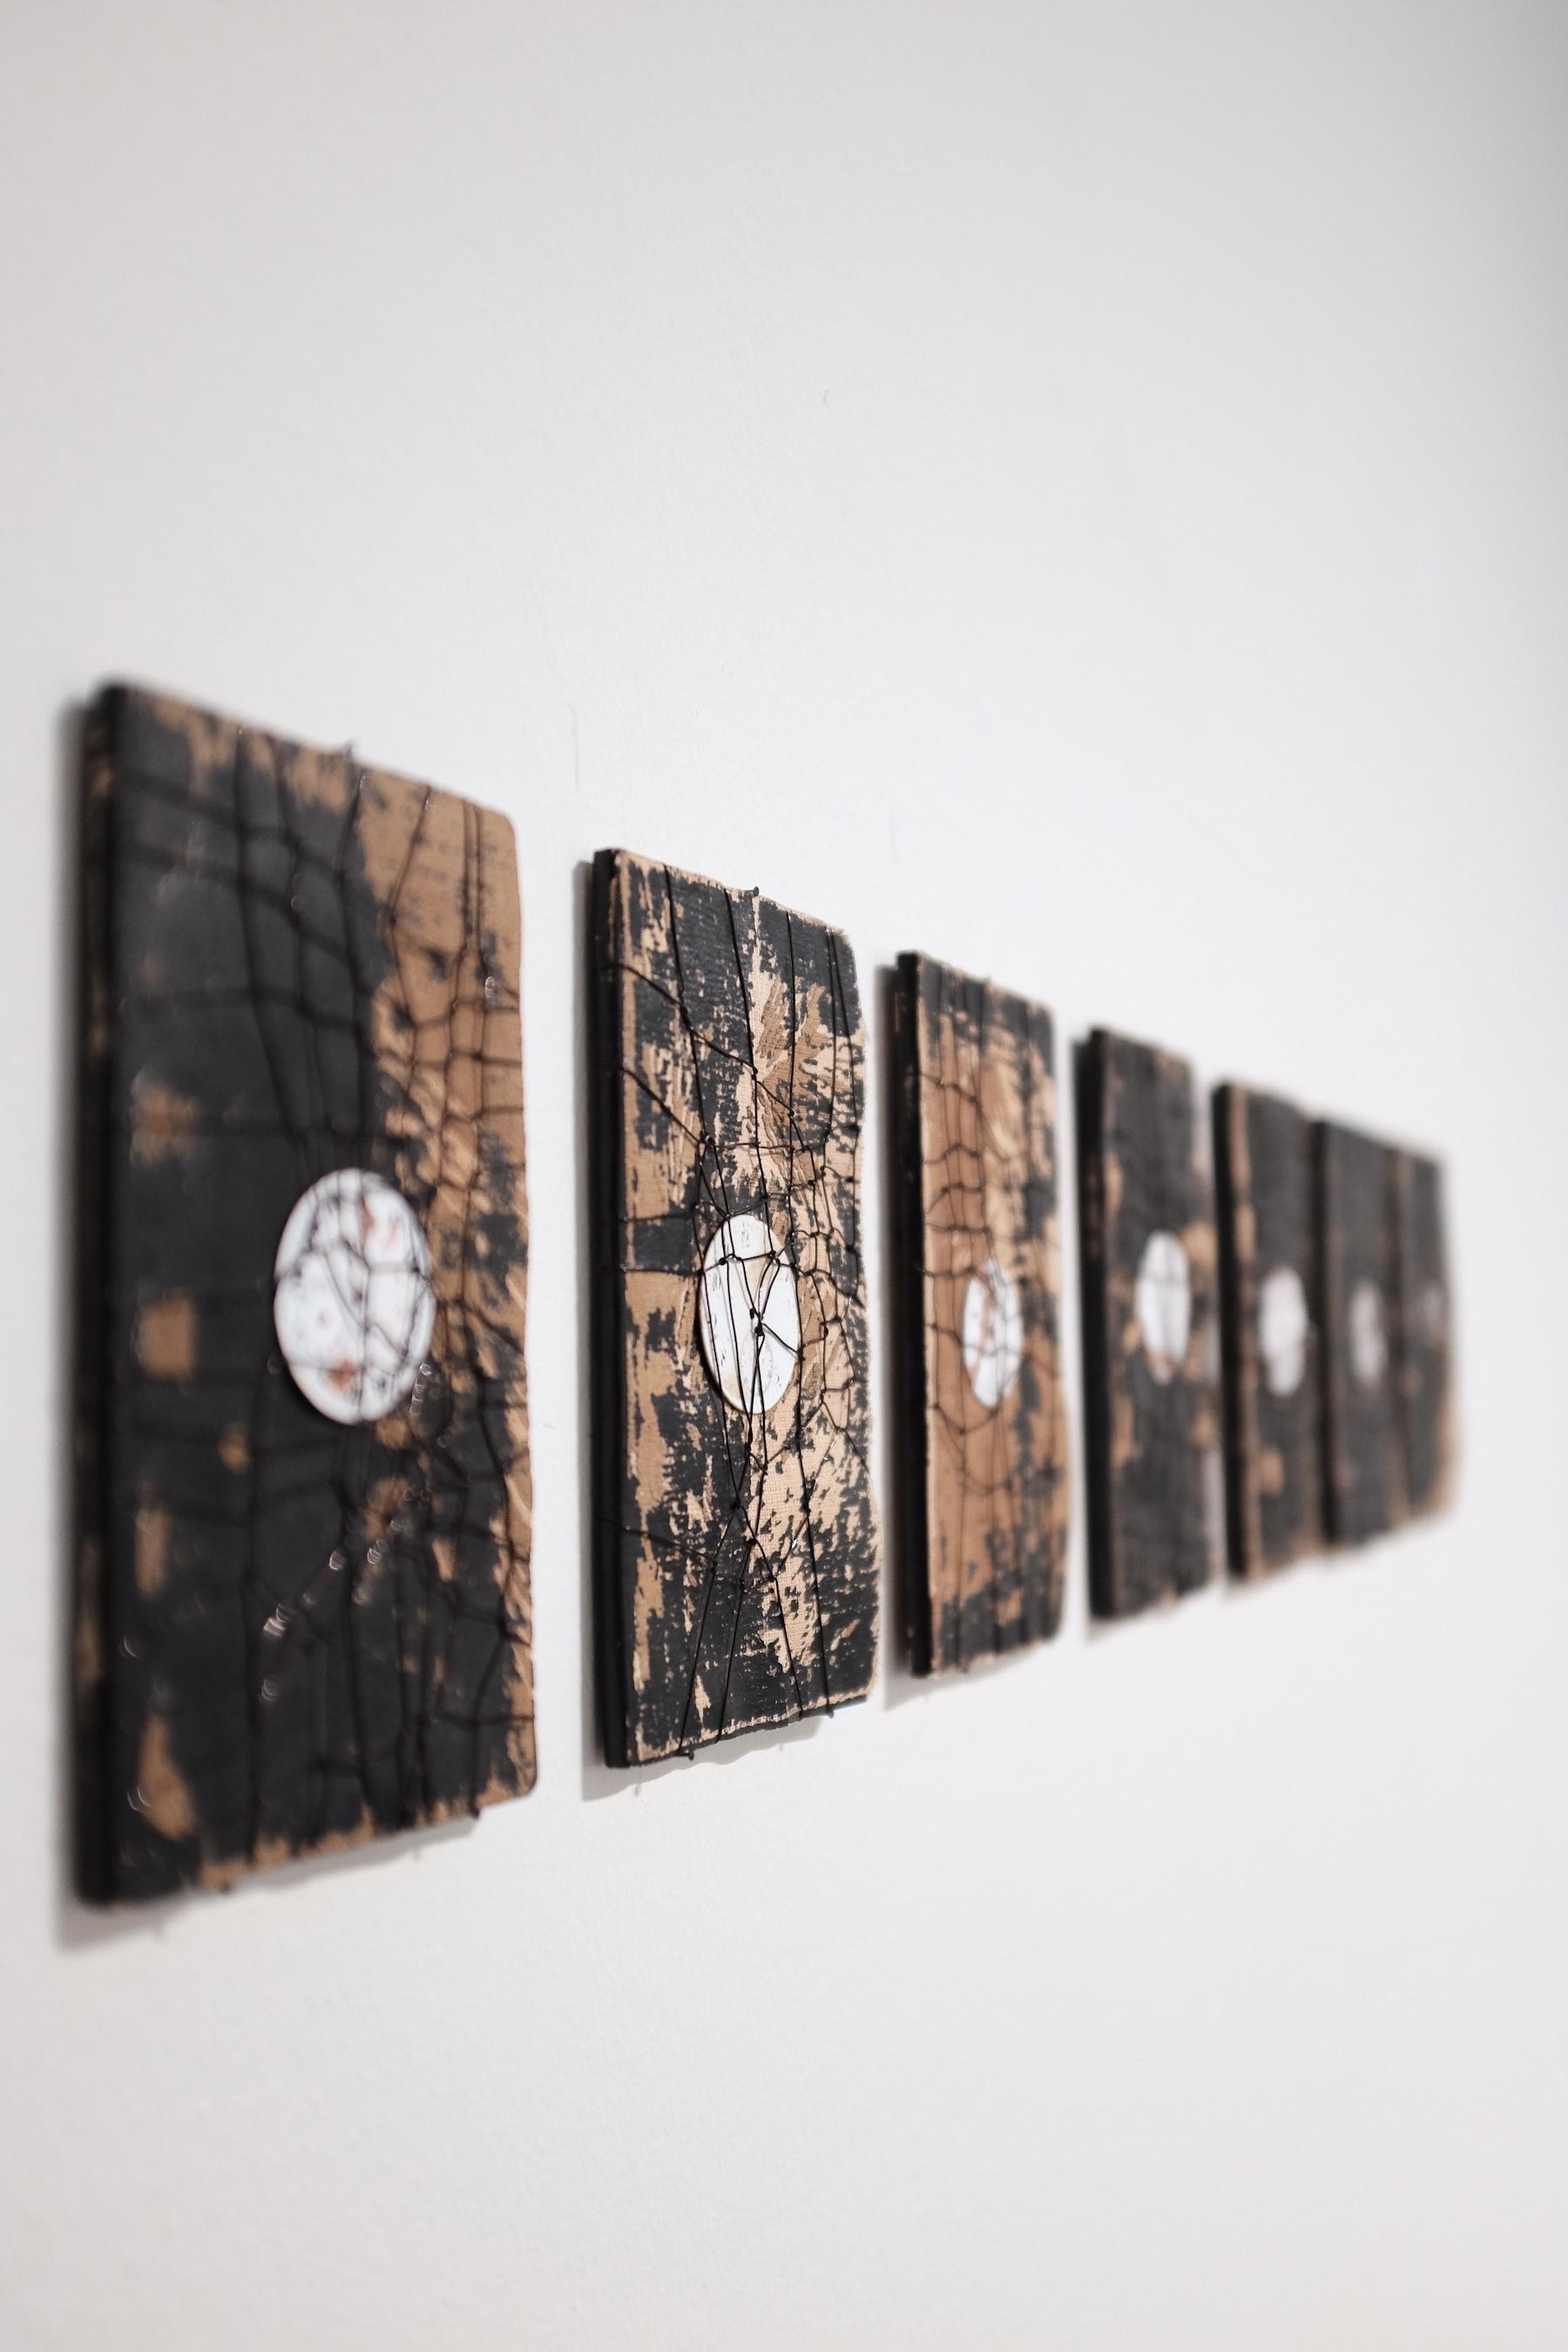 Christine Ferrer, Avec le temps,I – IX, 2018.